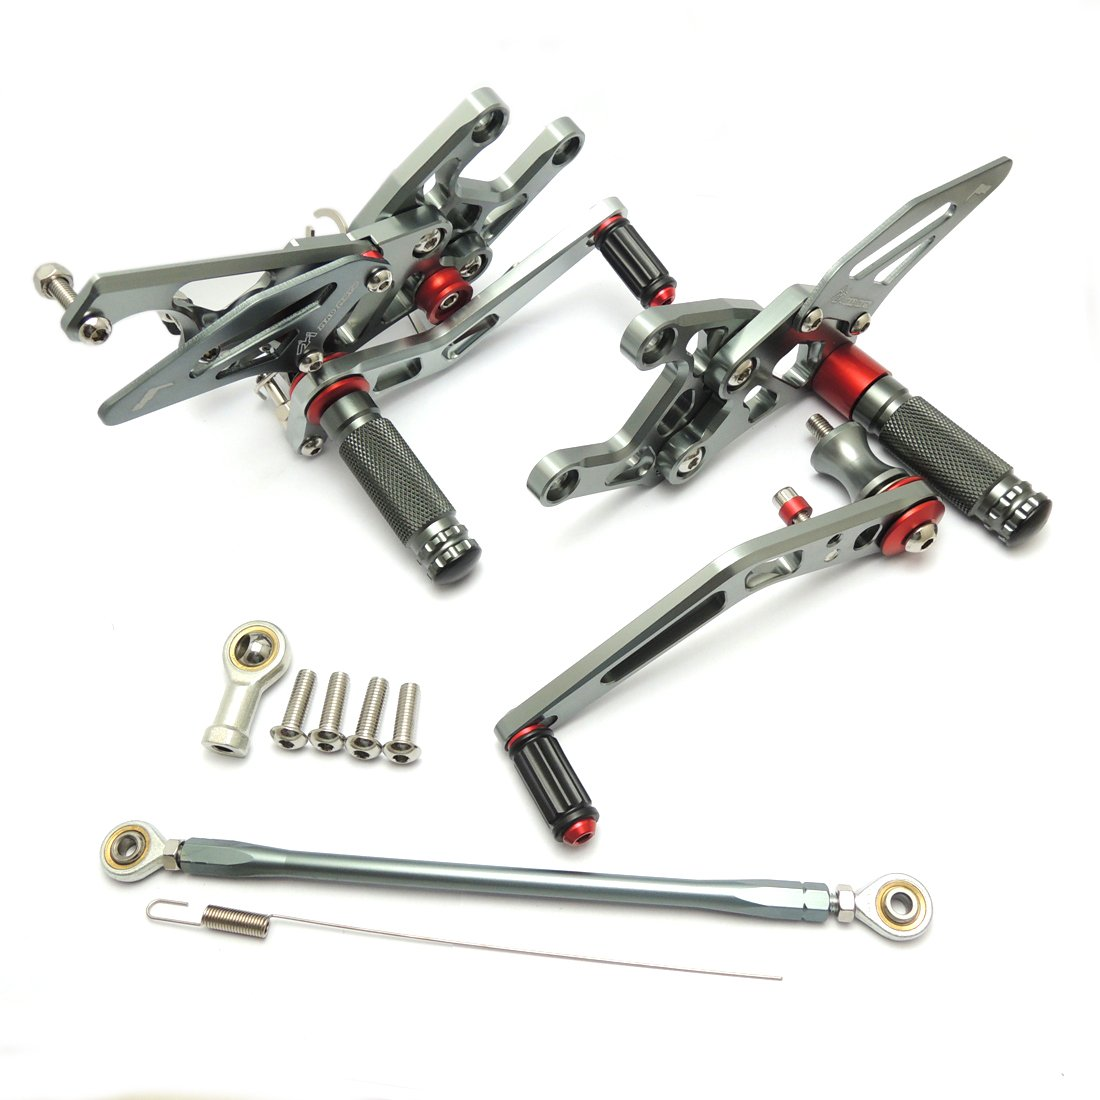 Titanium CBR1000RR Rearset CNC Adjustable Foot Pegs Rear Sets for Honda CBR 1000RR 2008-2014